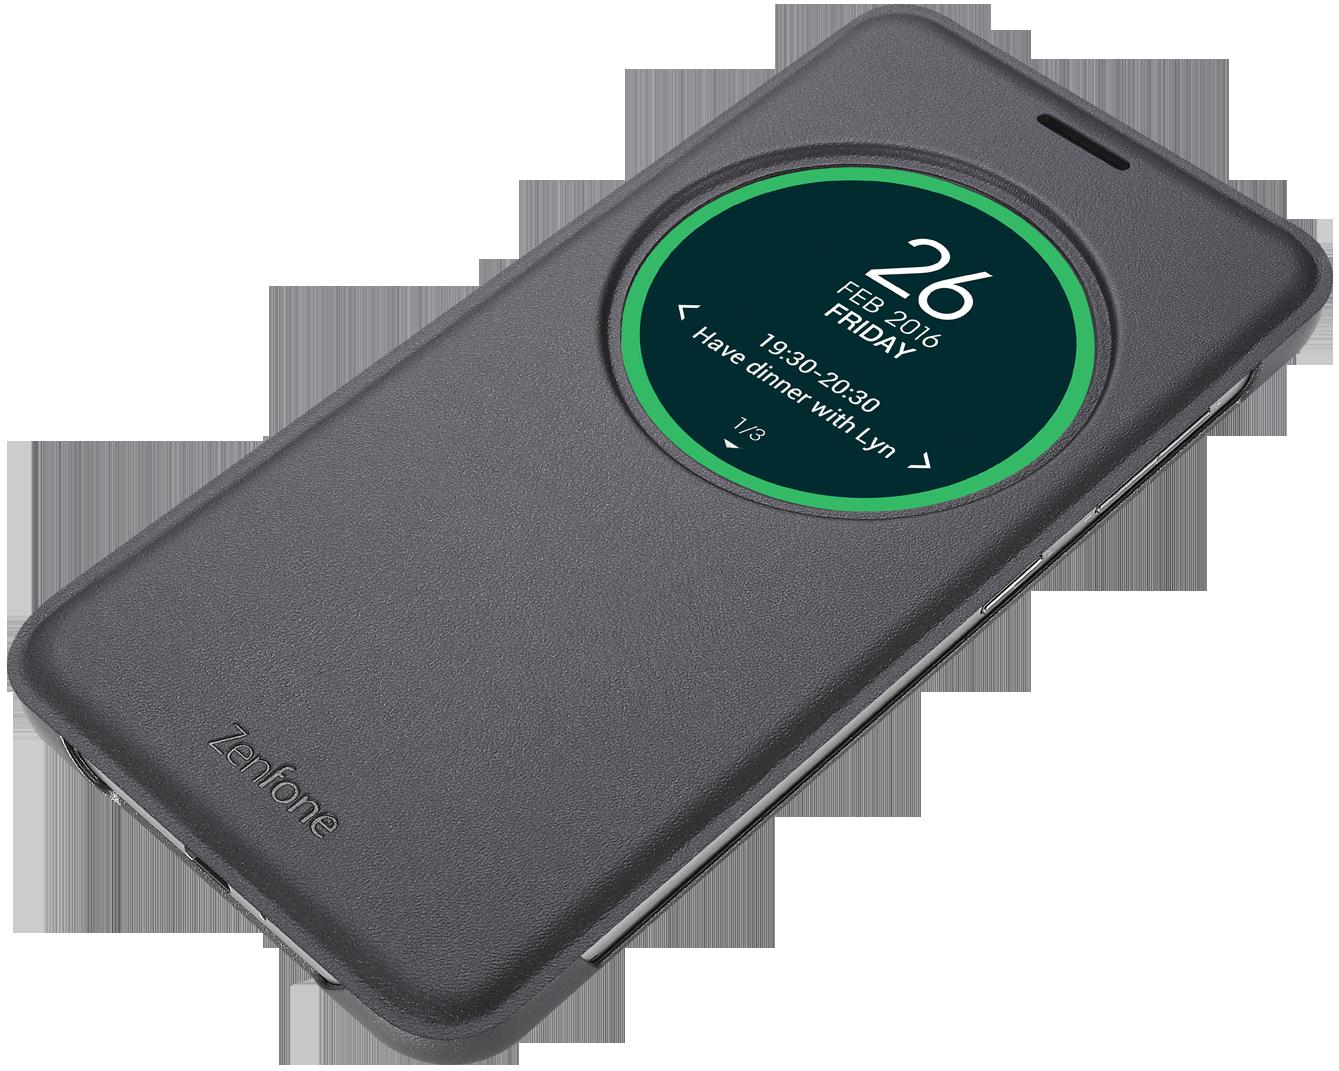 newest bc9d7 7fac8 ZenFone Max View Flip Case (ZC550KL) | Phone Accessories | ASUS Global